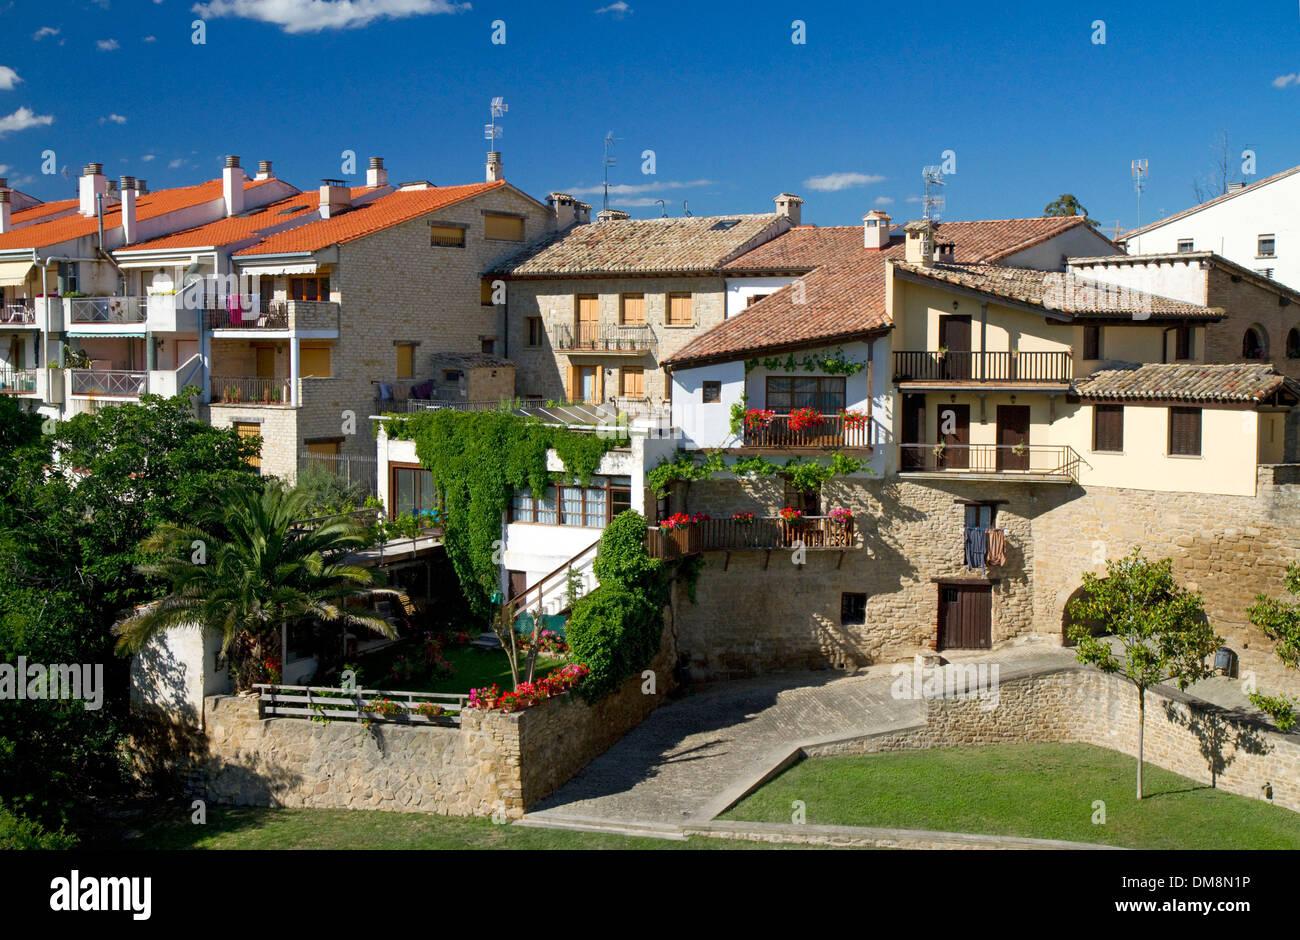 Puente La Reina is a Basque town along the Way of St. James pilgrimage route, Navarra, Spain. - Stock Image